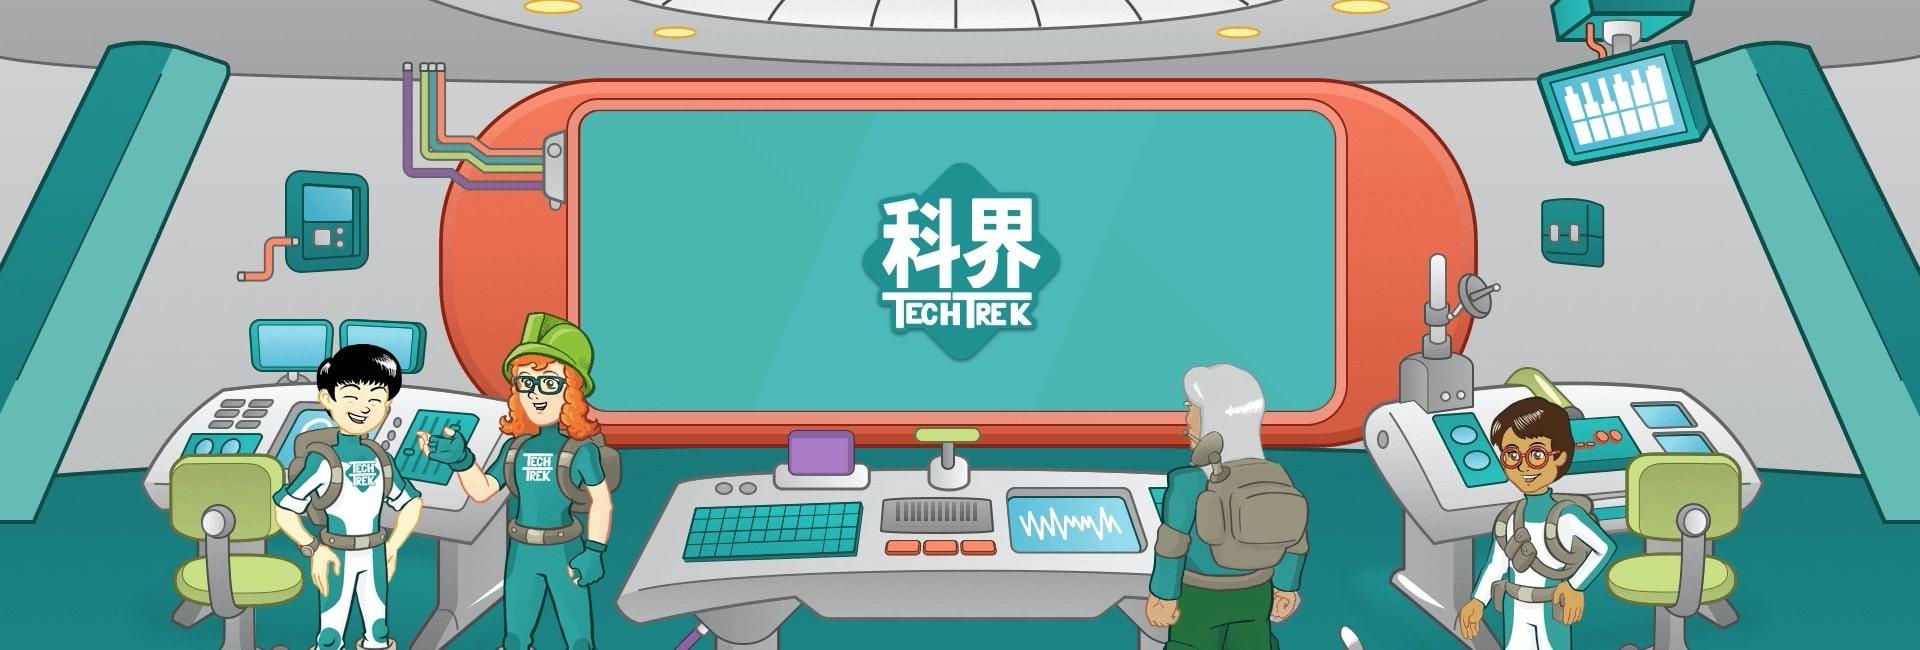 TECHTREK——基于游戏的电子学习解决方案